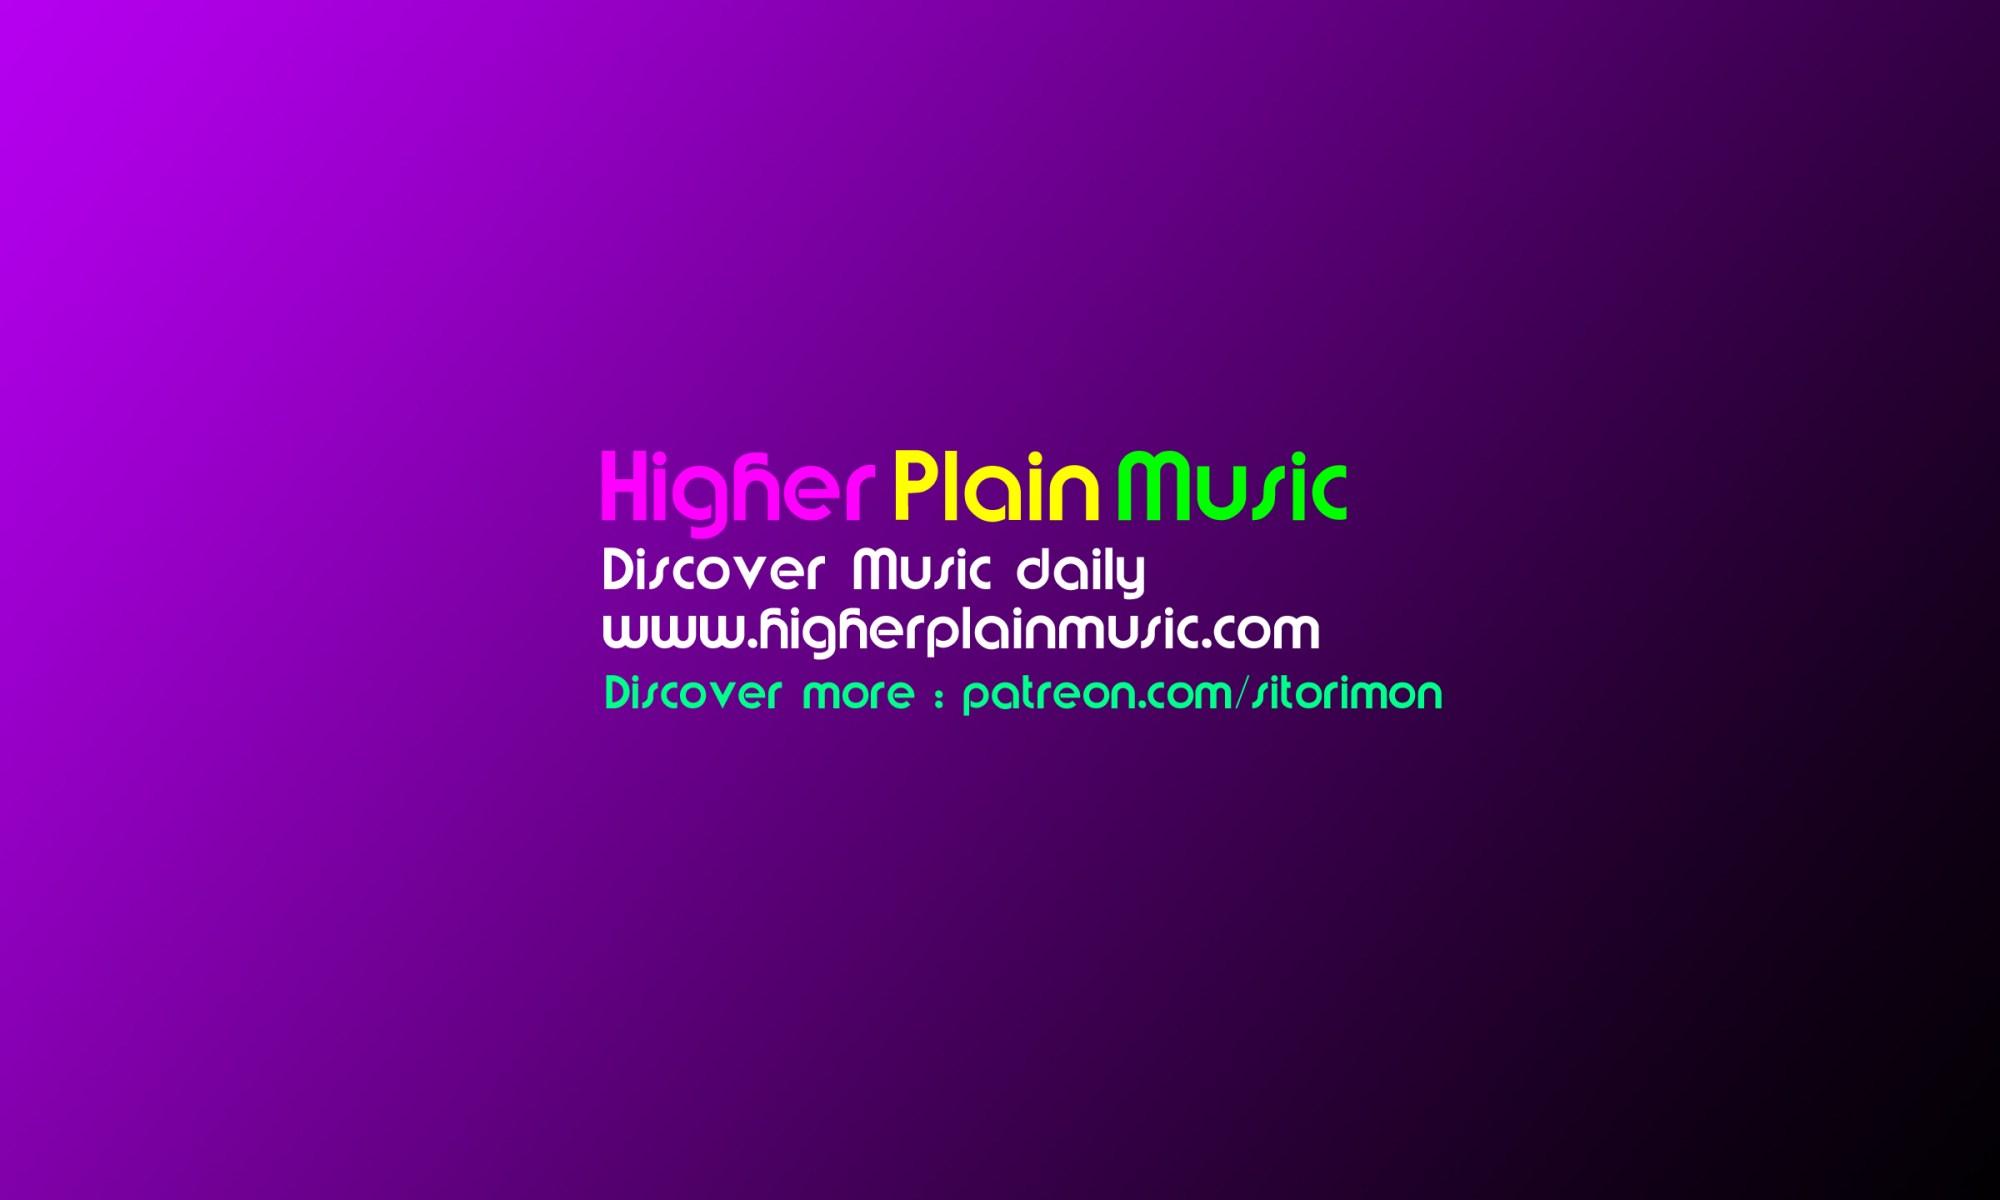 Higher Plain Music